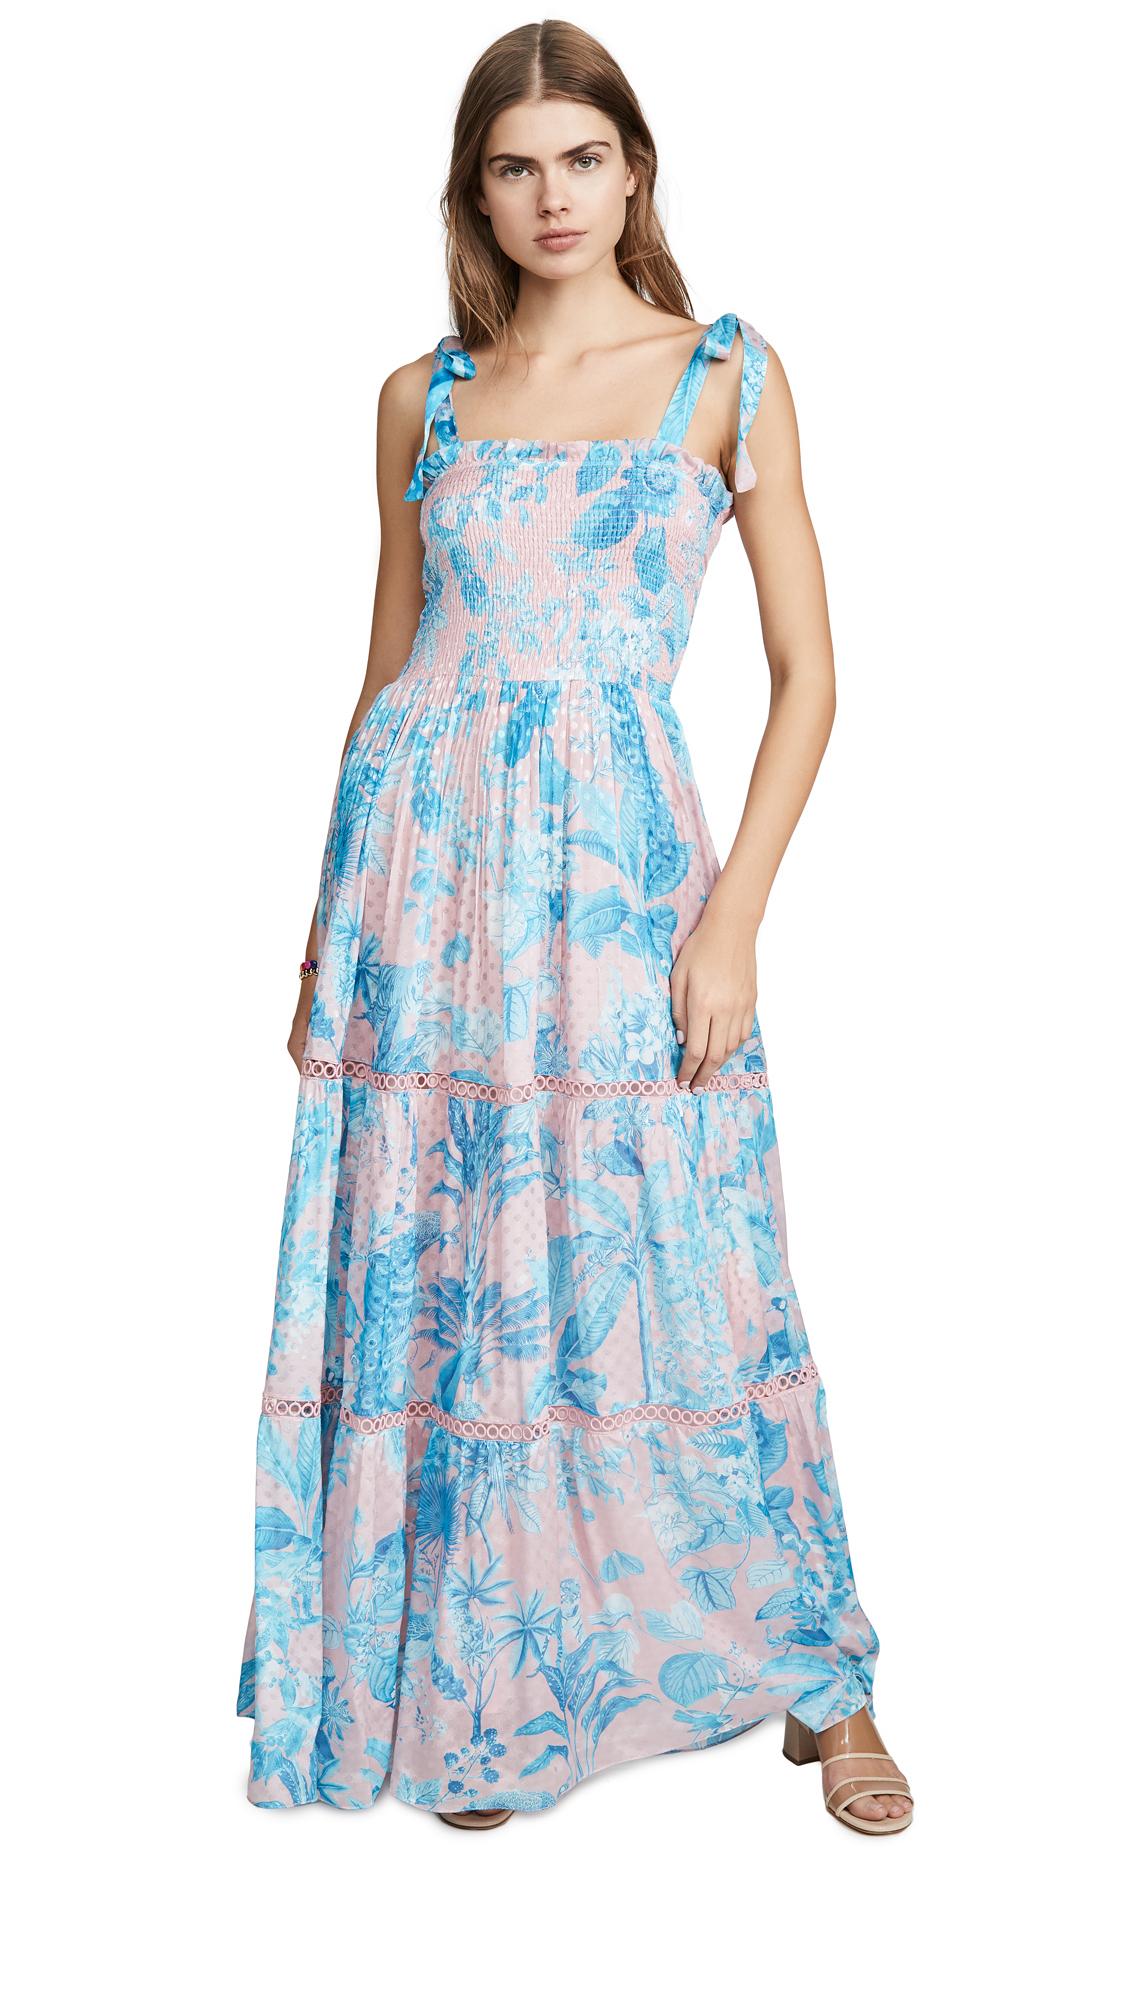 Hemant and Nandita Long Dress